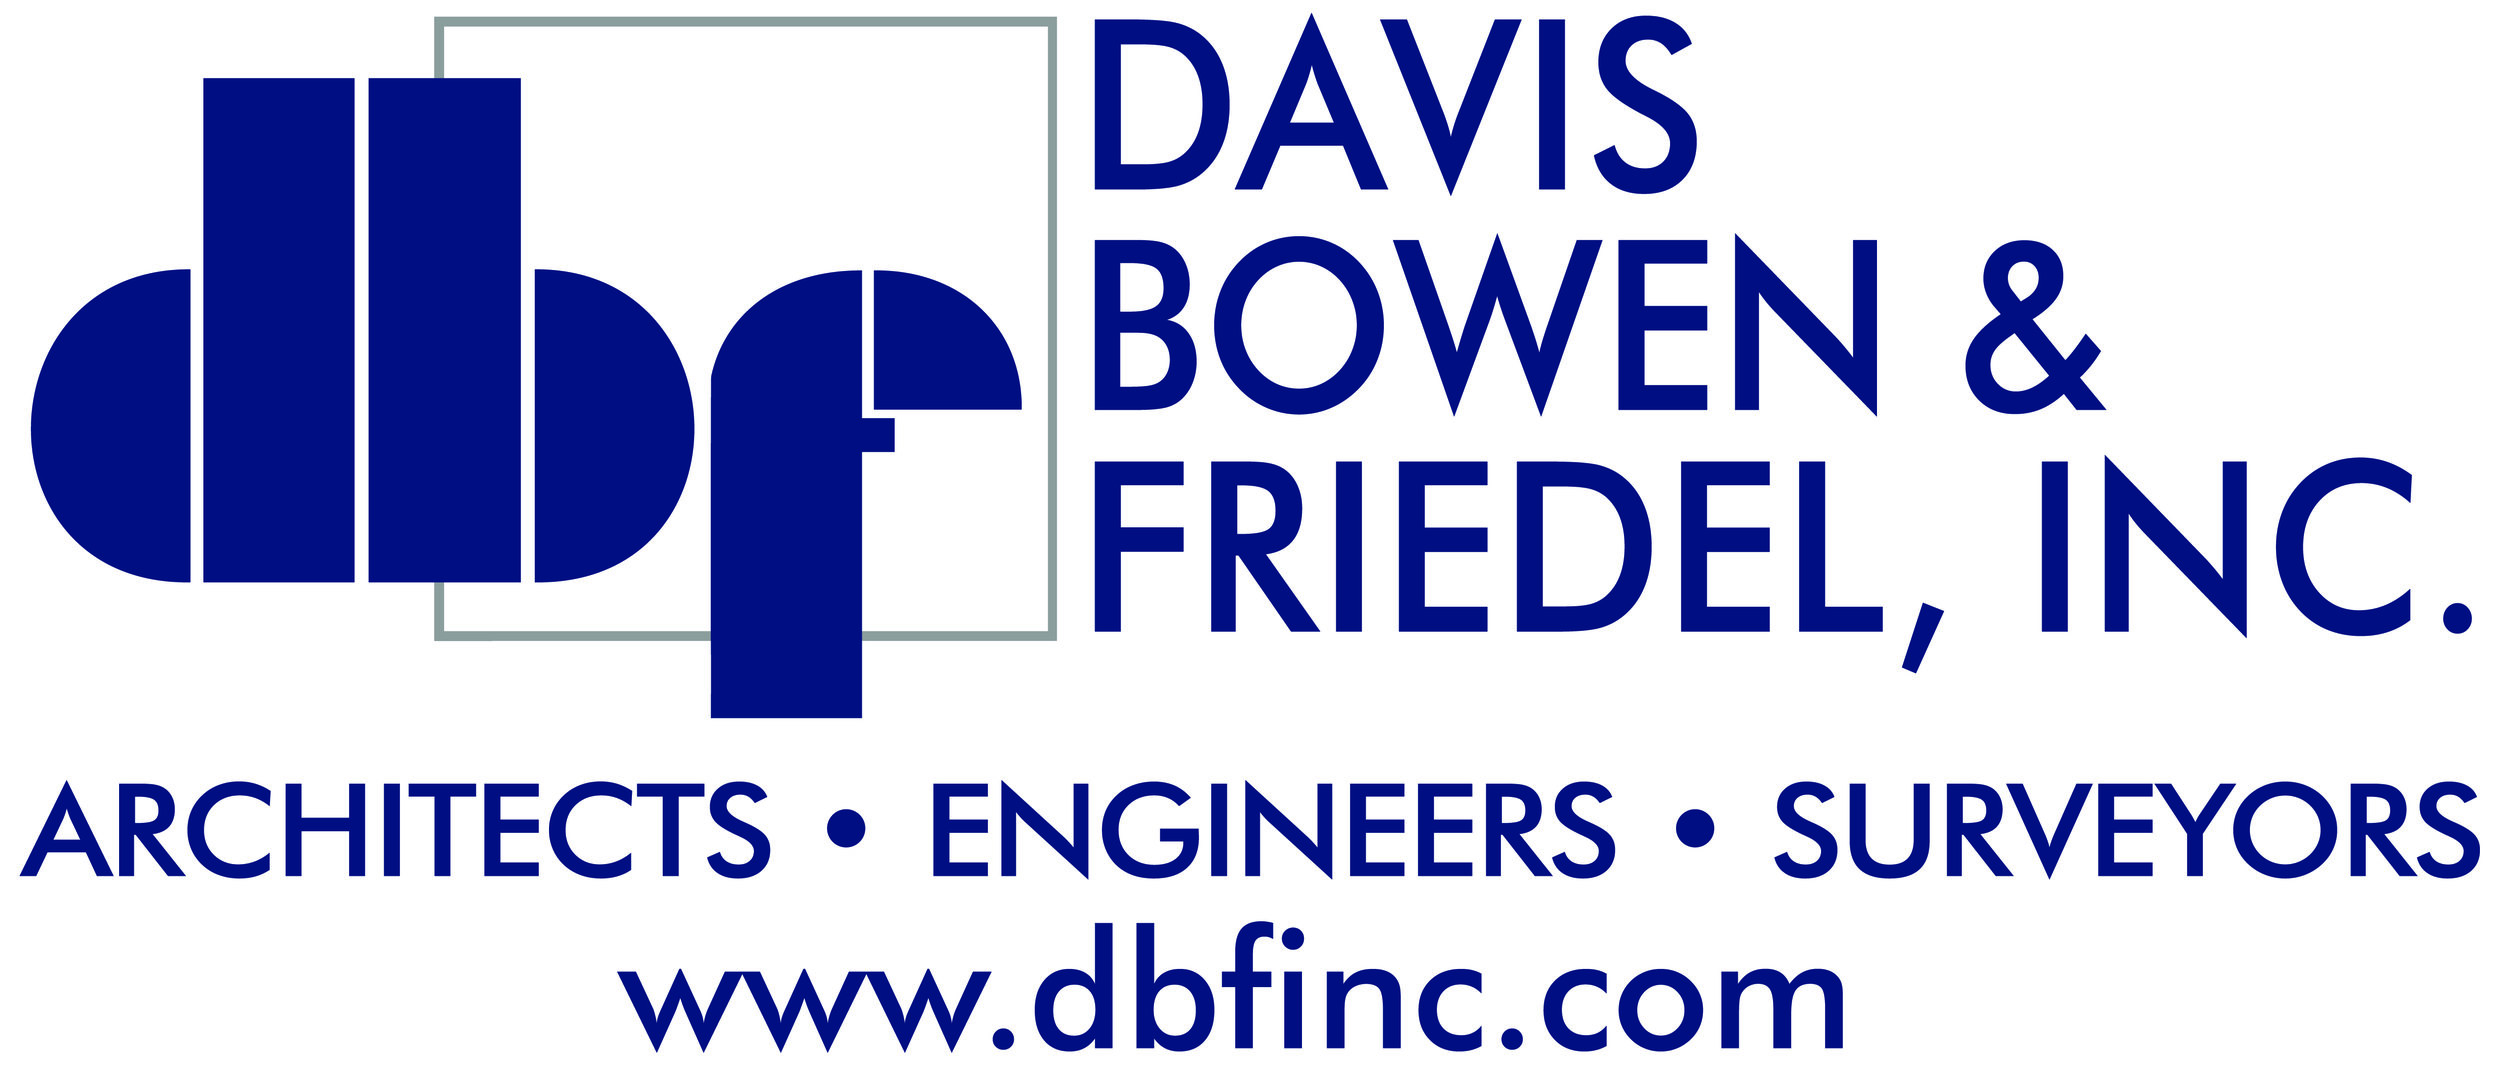 DBF with AES web address_lg.jpg